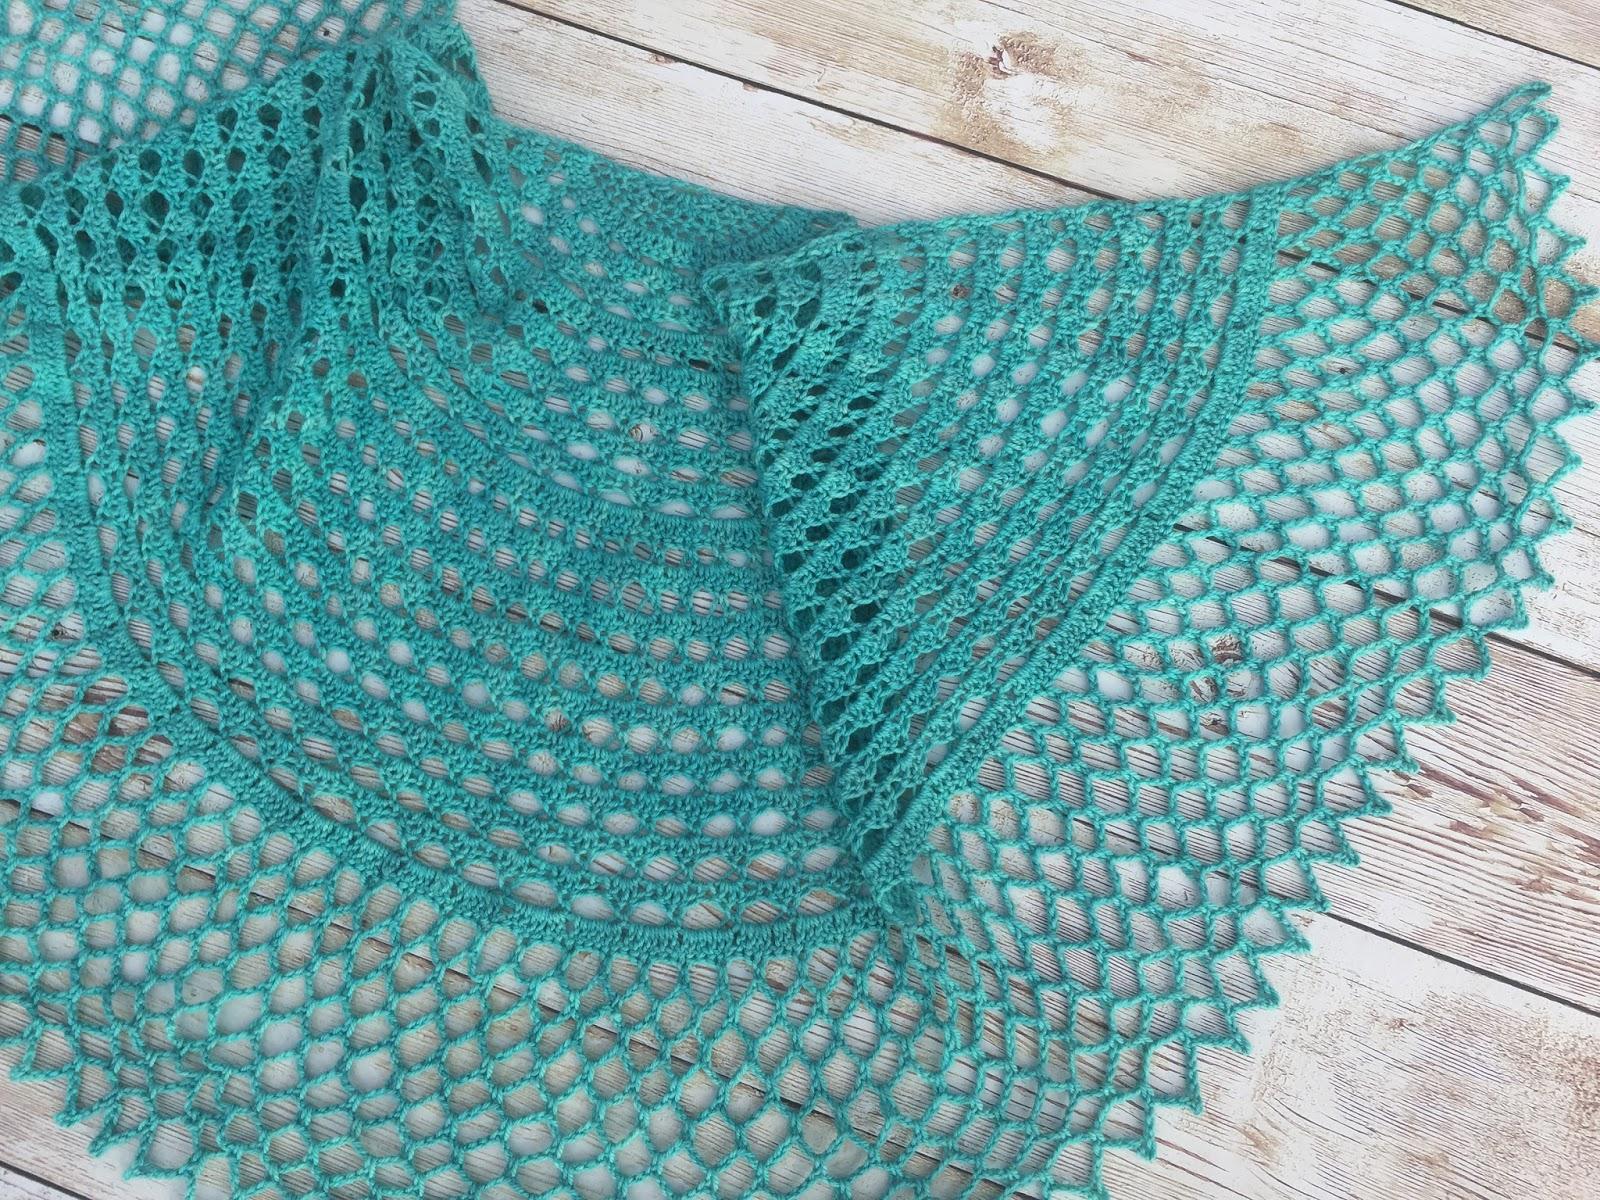 Knitting Like Crazy: My First Crochet Shawl Pattern